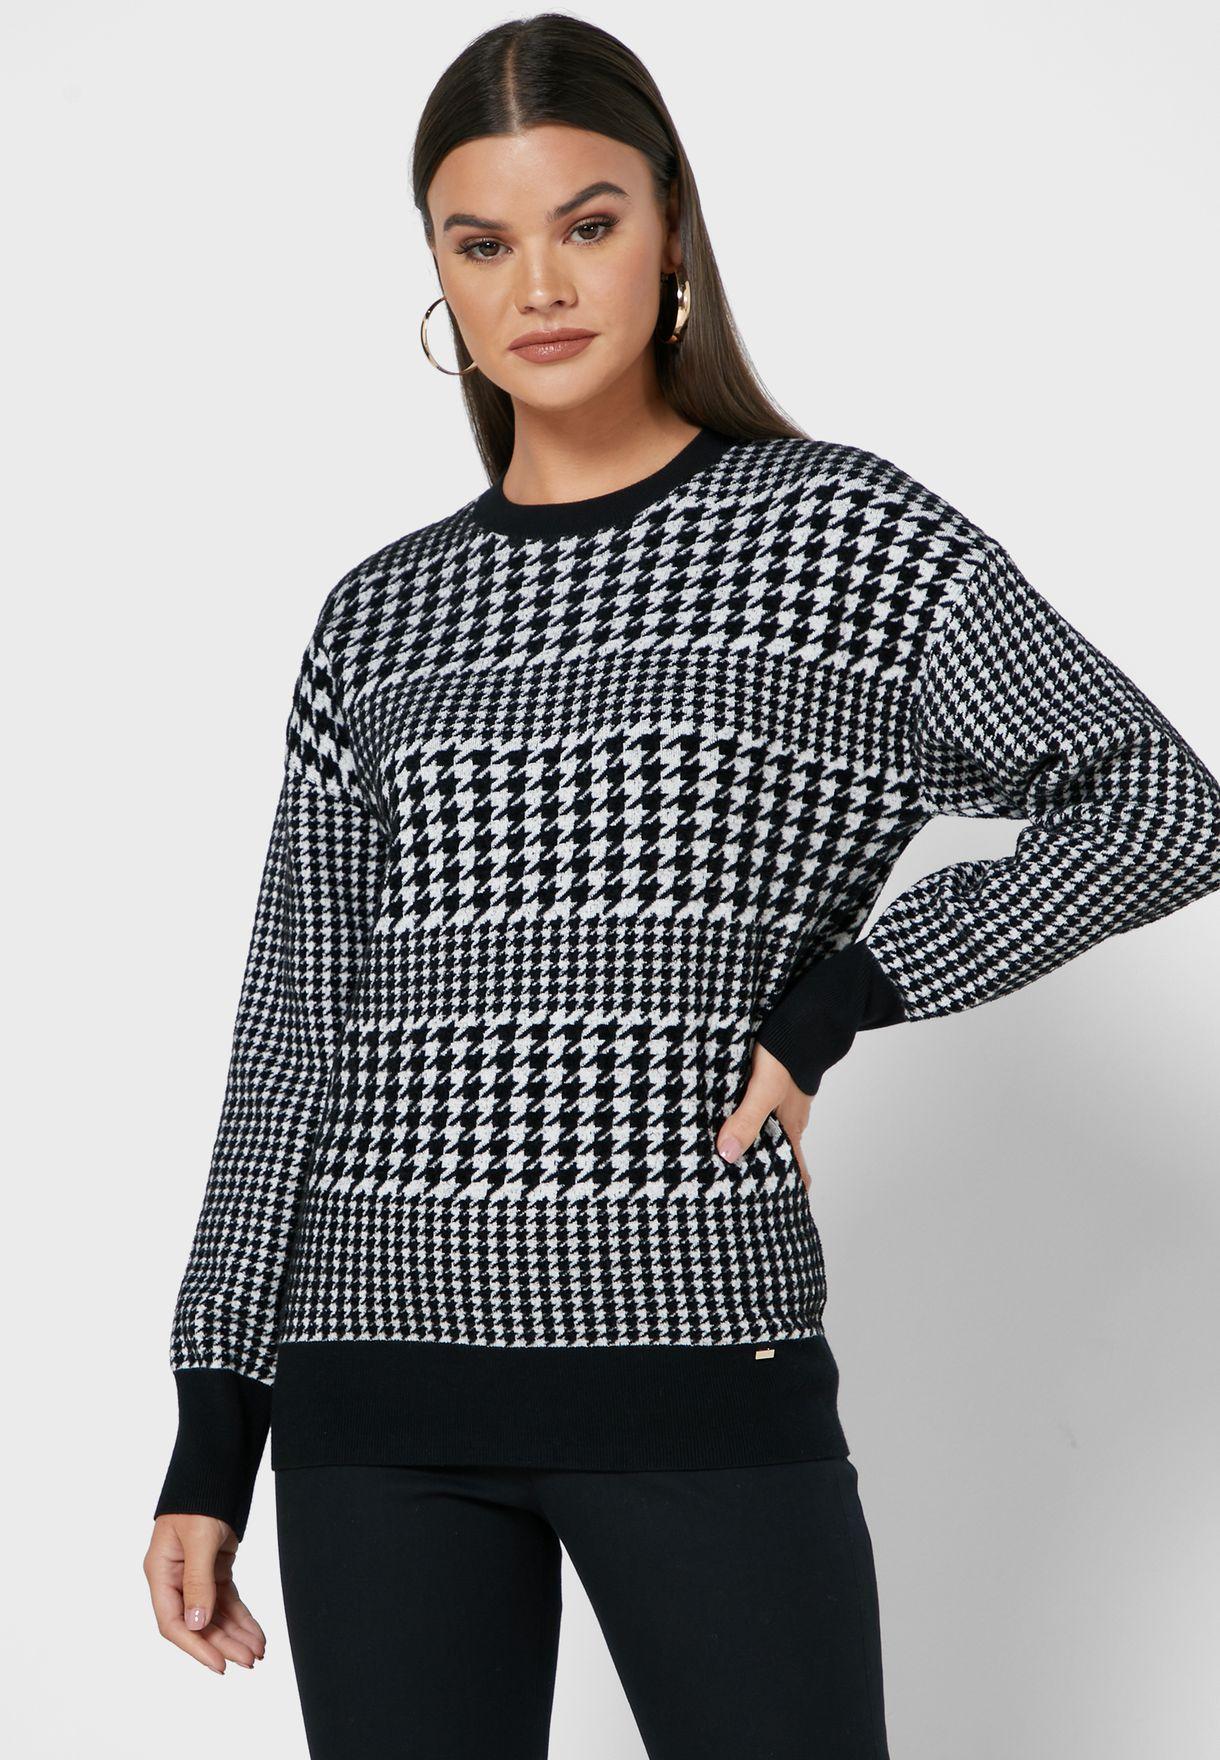 Novahh Round Neck Sweater